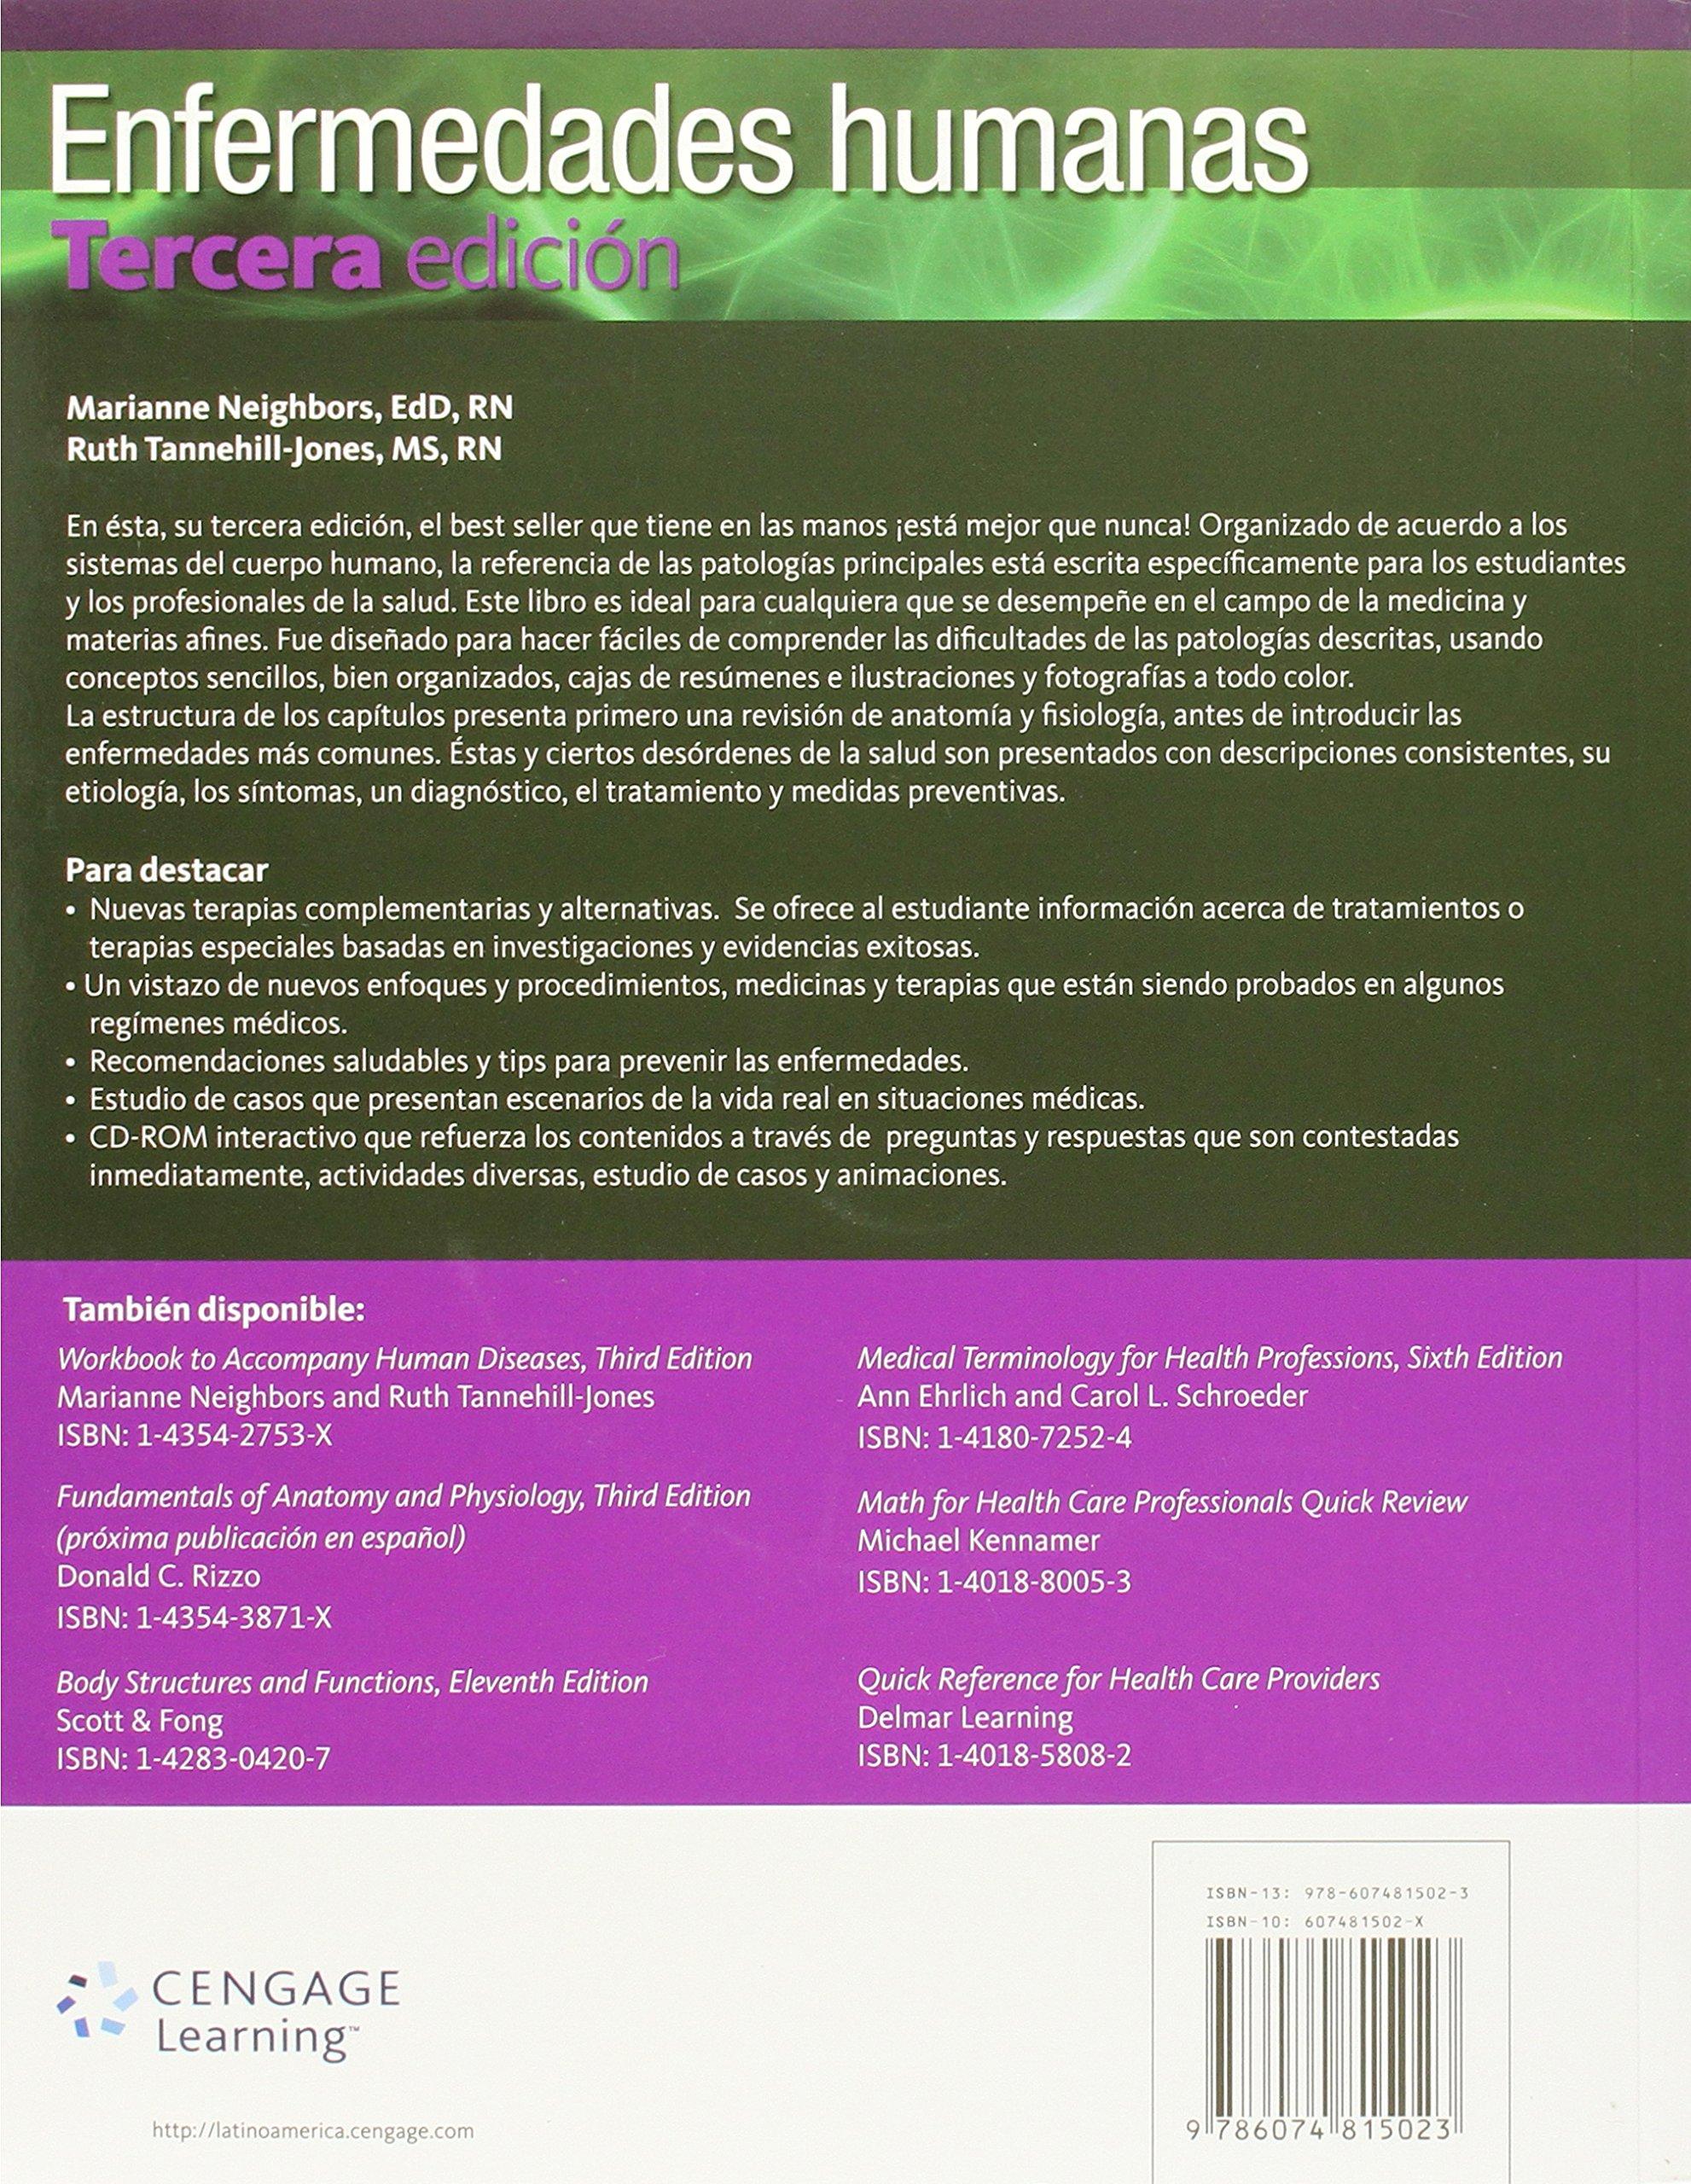 Enfermedades Humanas - 3ª Edición: Amazon.es: Marianne Neighbors: Libros